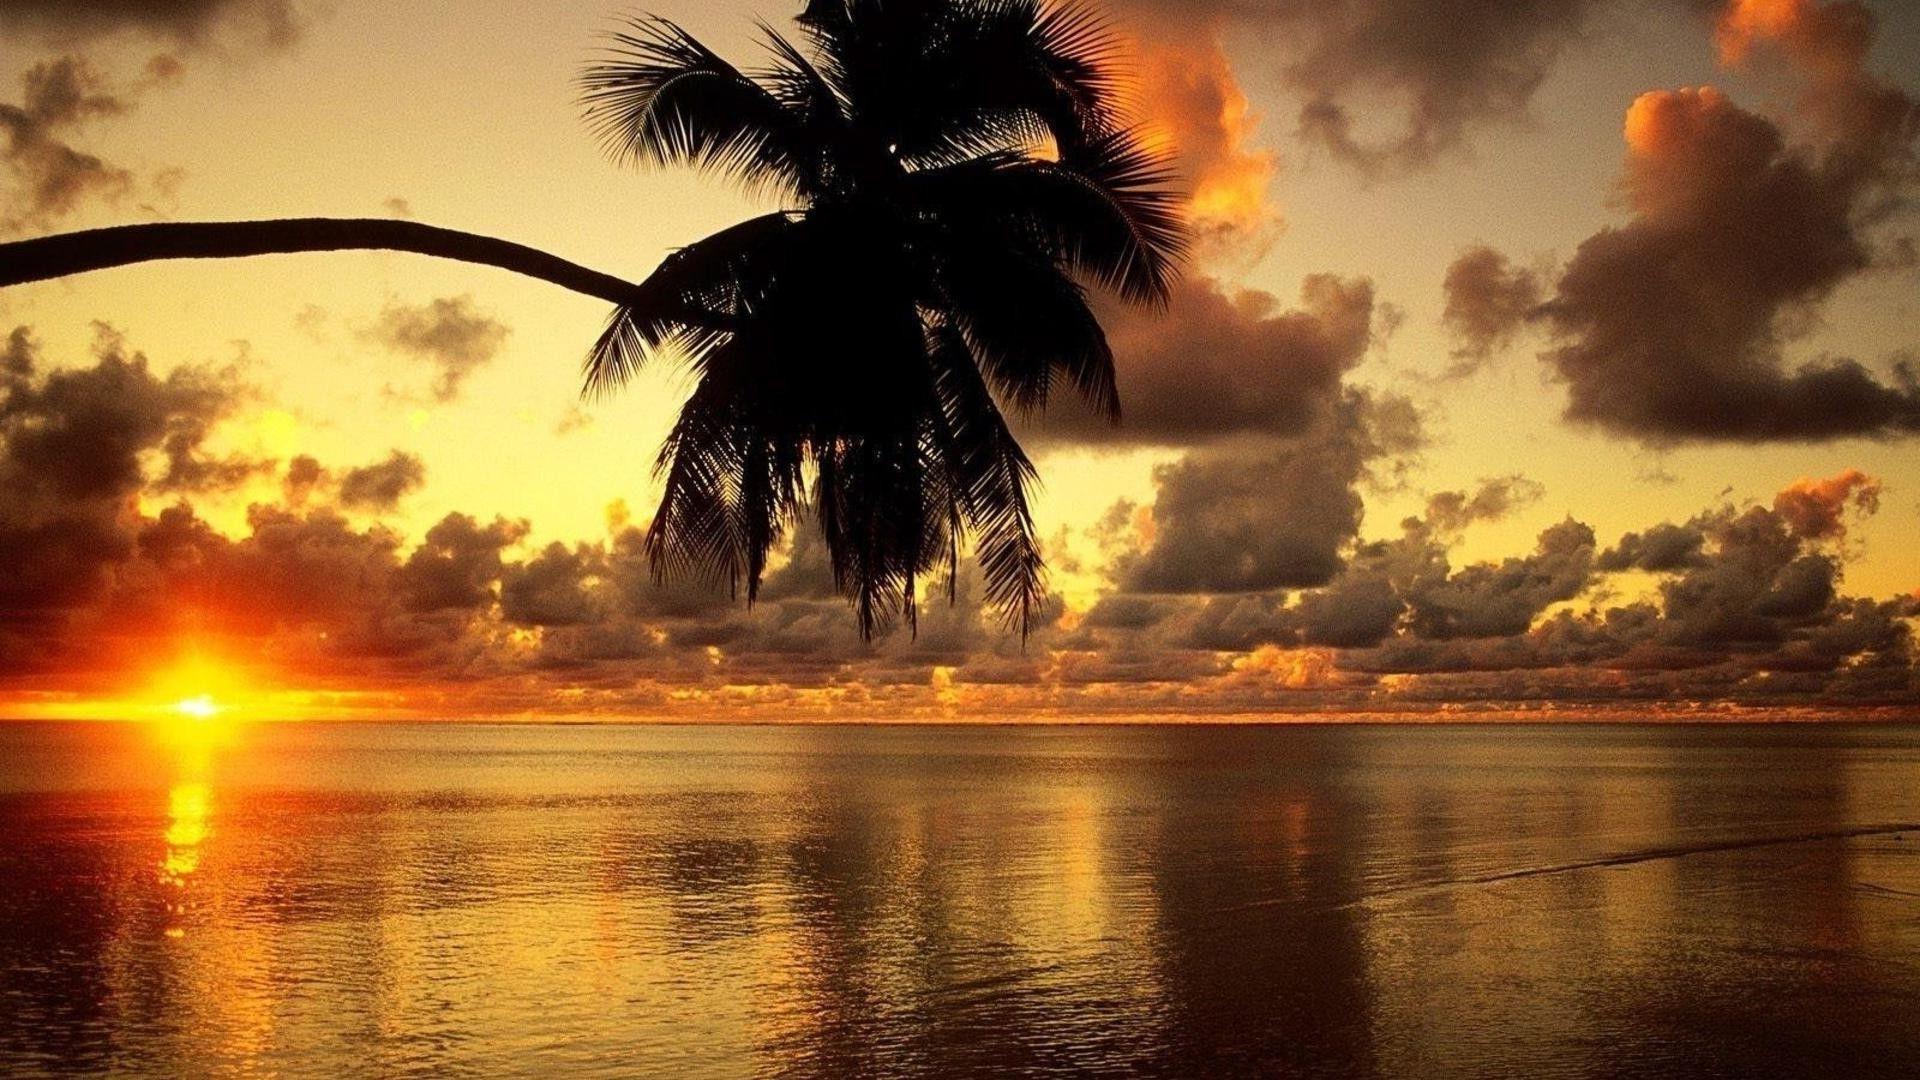 Aloha Wallpaper Image